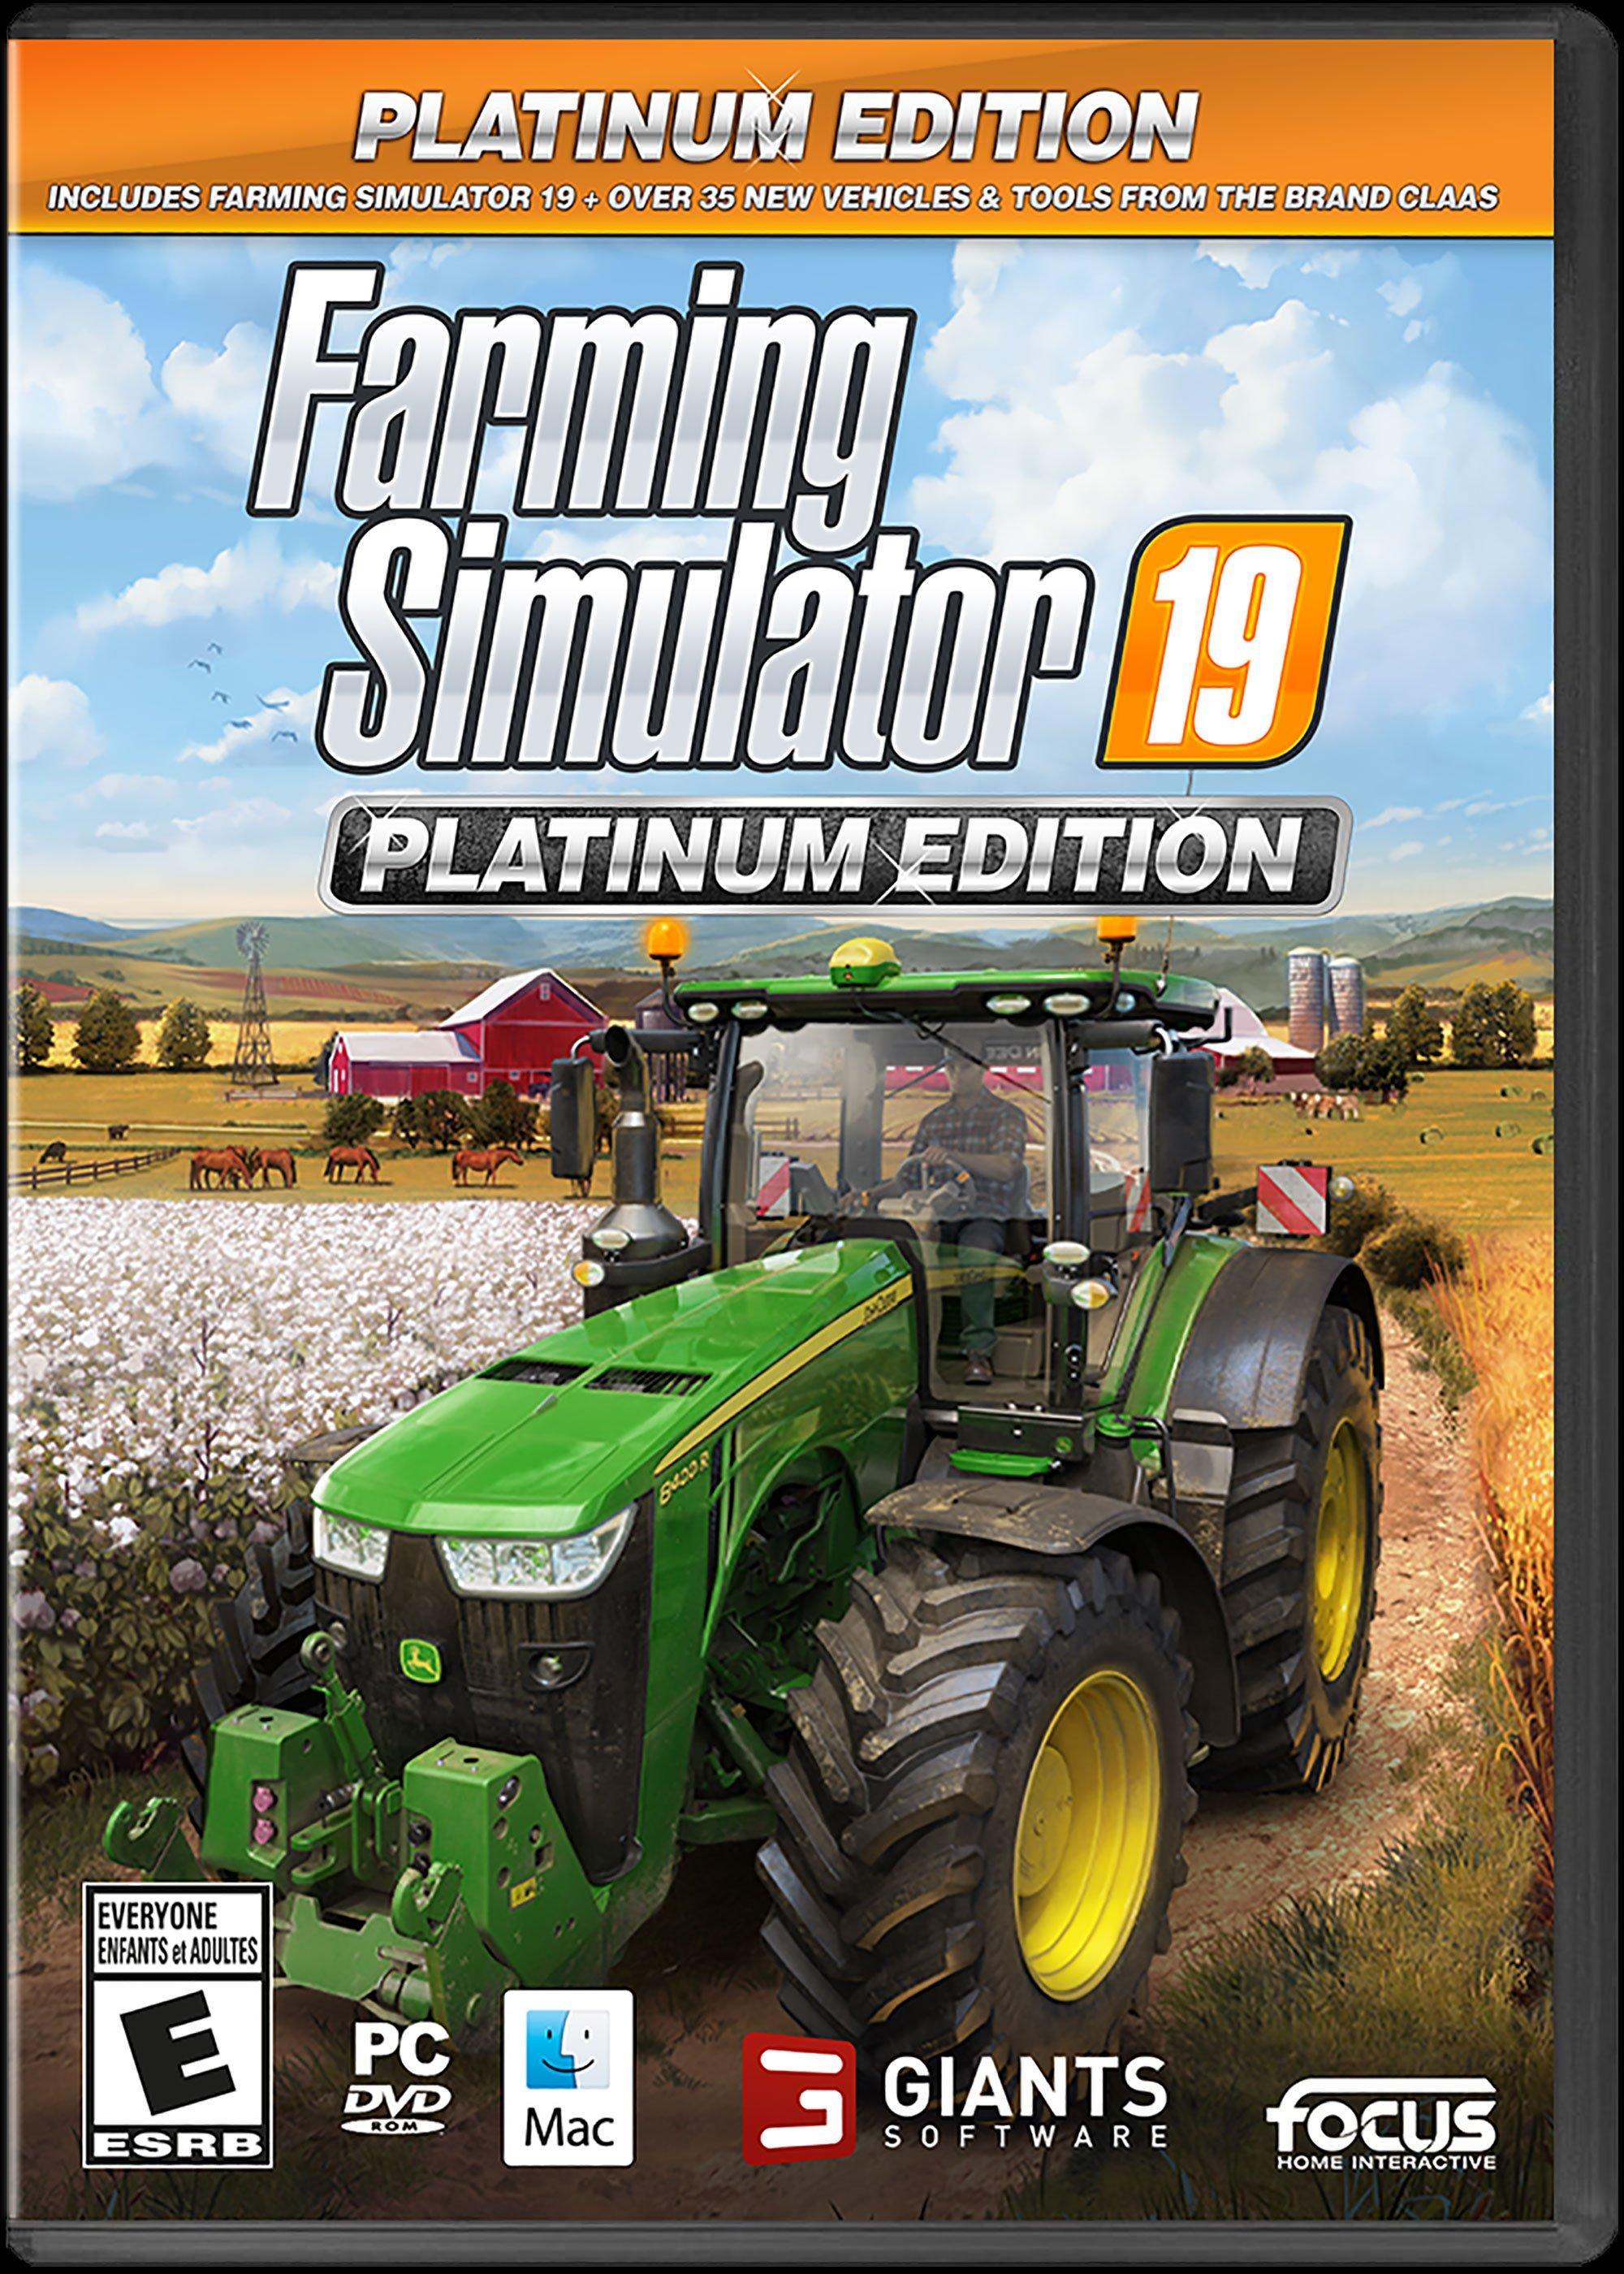 Farming simulator 19 - platinum edition download free pc